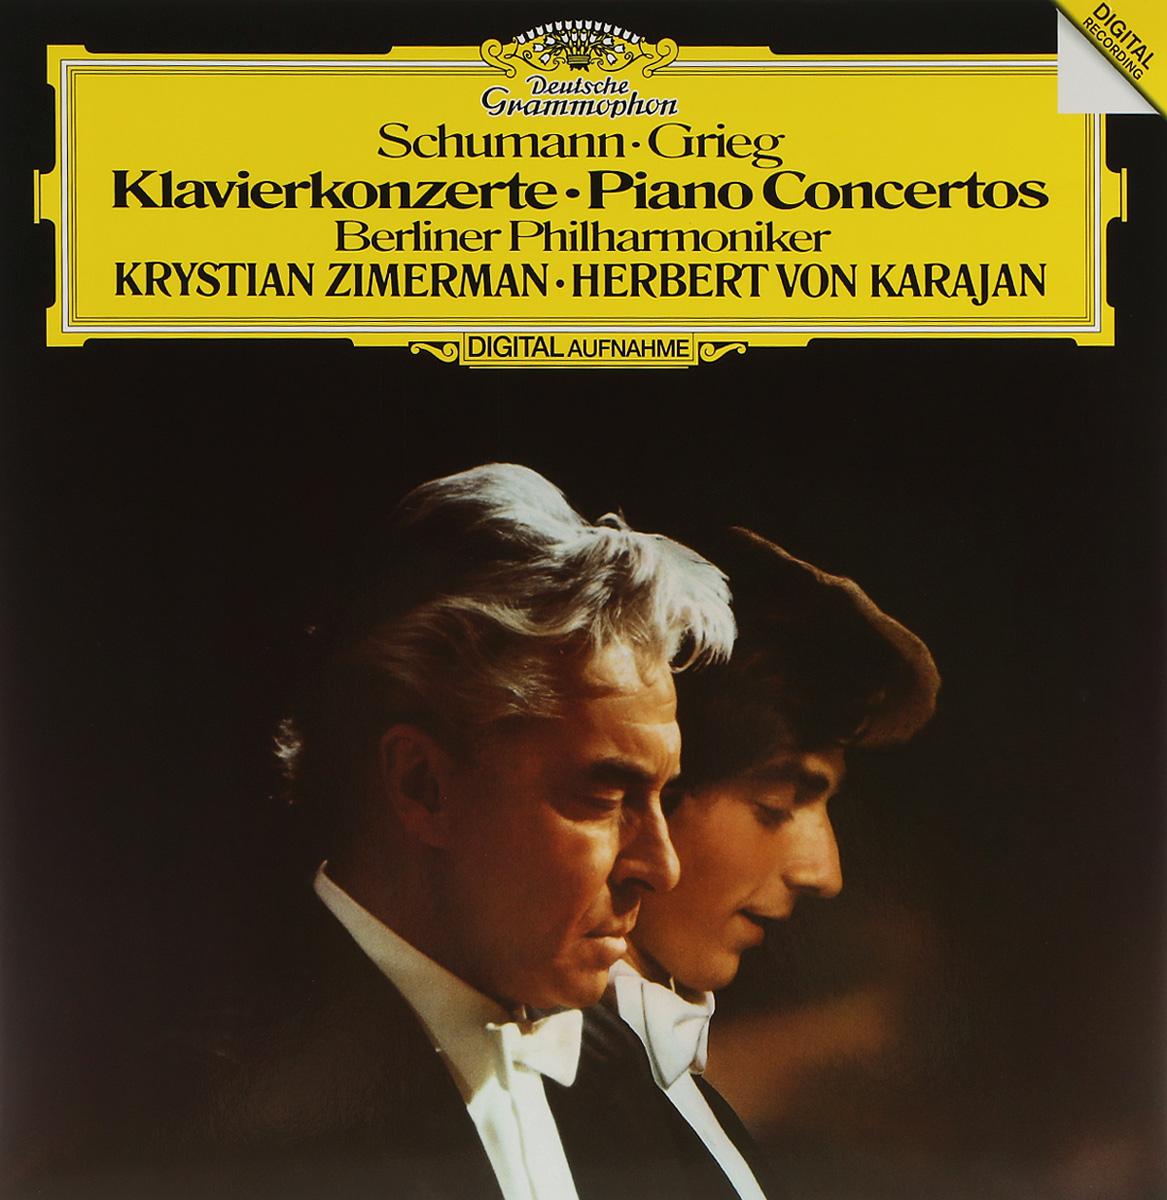 Герберт Караян,Berliner Philharmoniker Herbert Von Karajan. Schumann. Grieg. Klavierkonzerte (LP) цена и фото